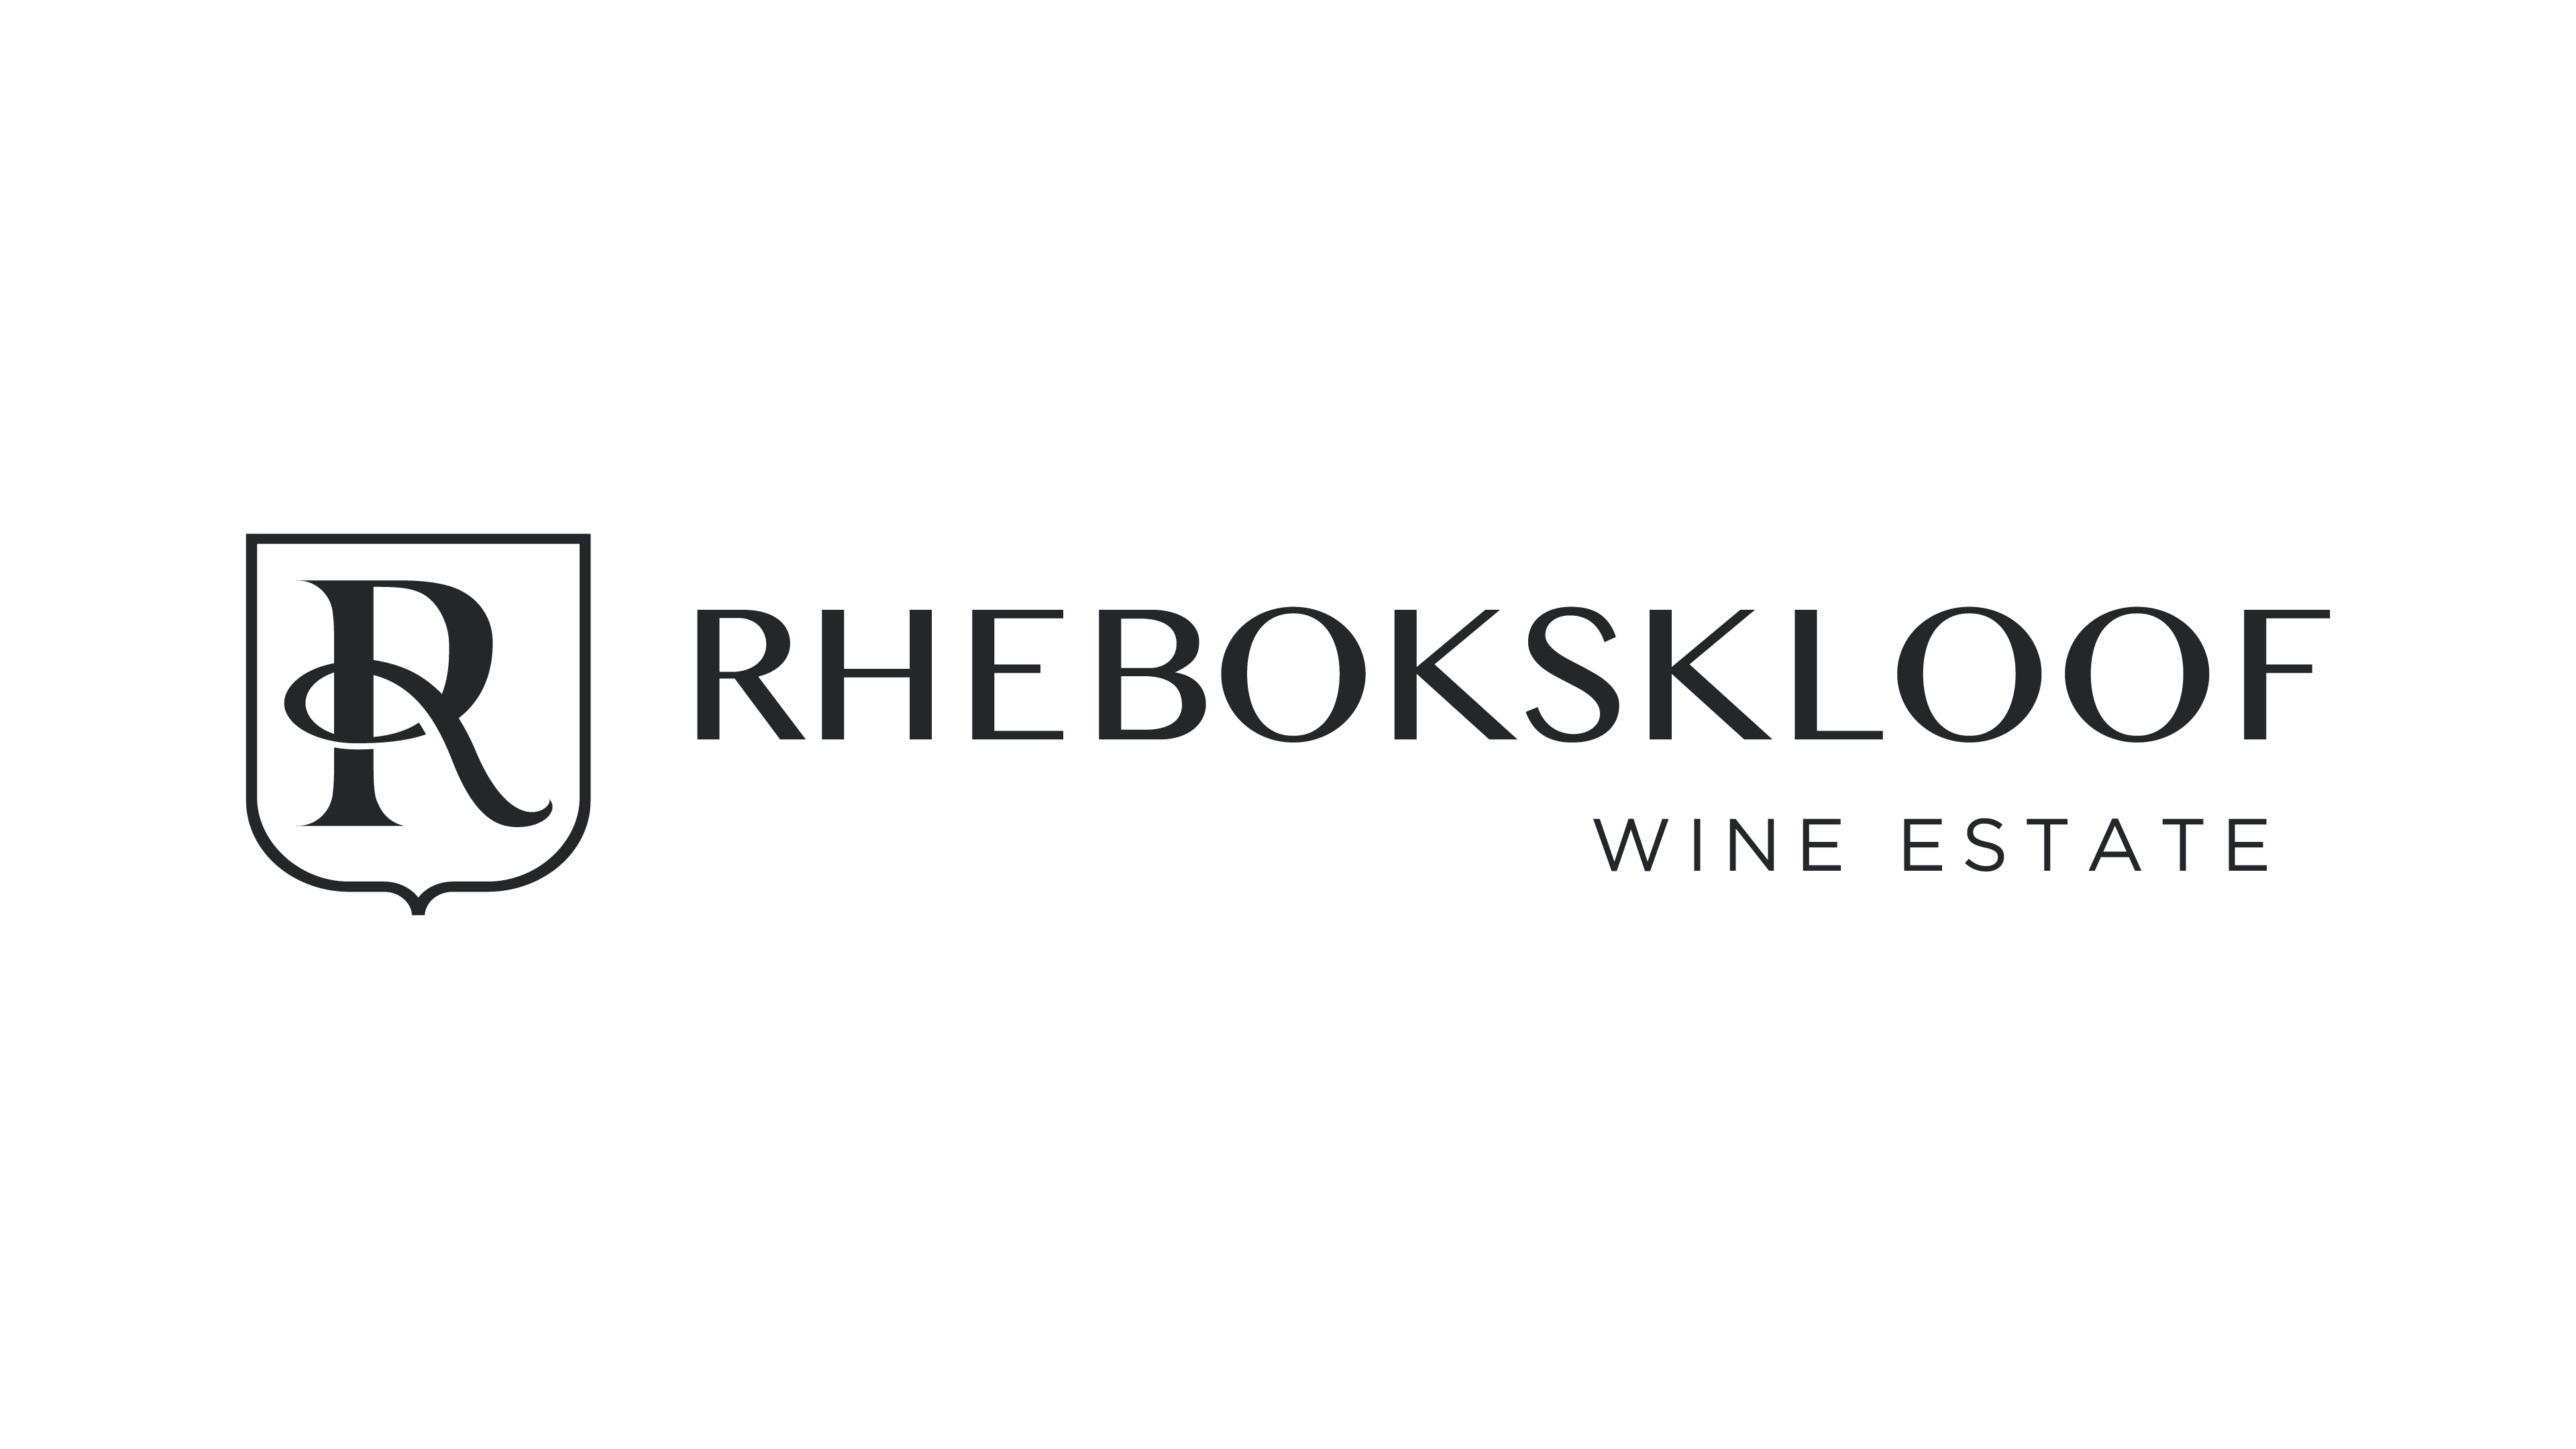 Rhebokskloof Wine Estate - South Africa